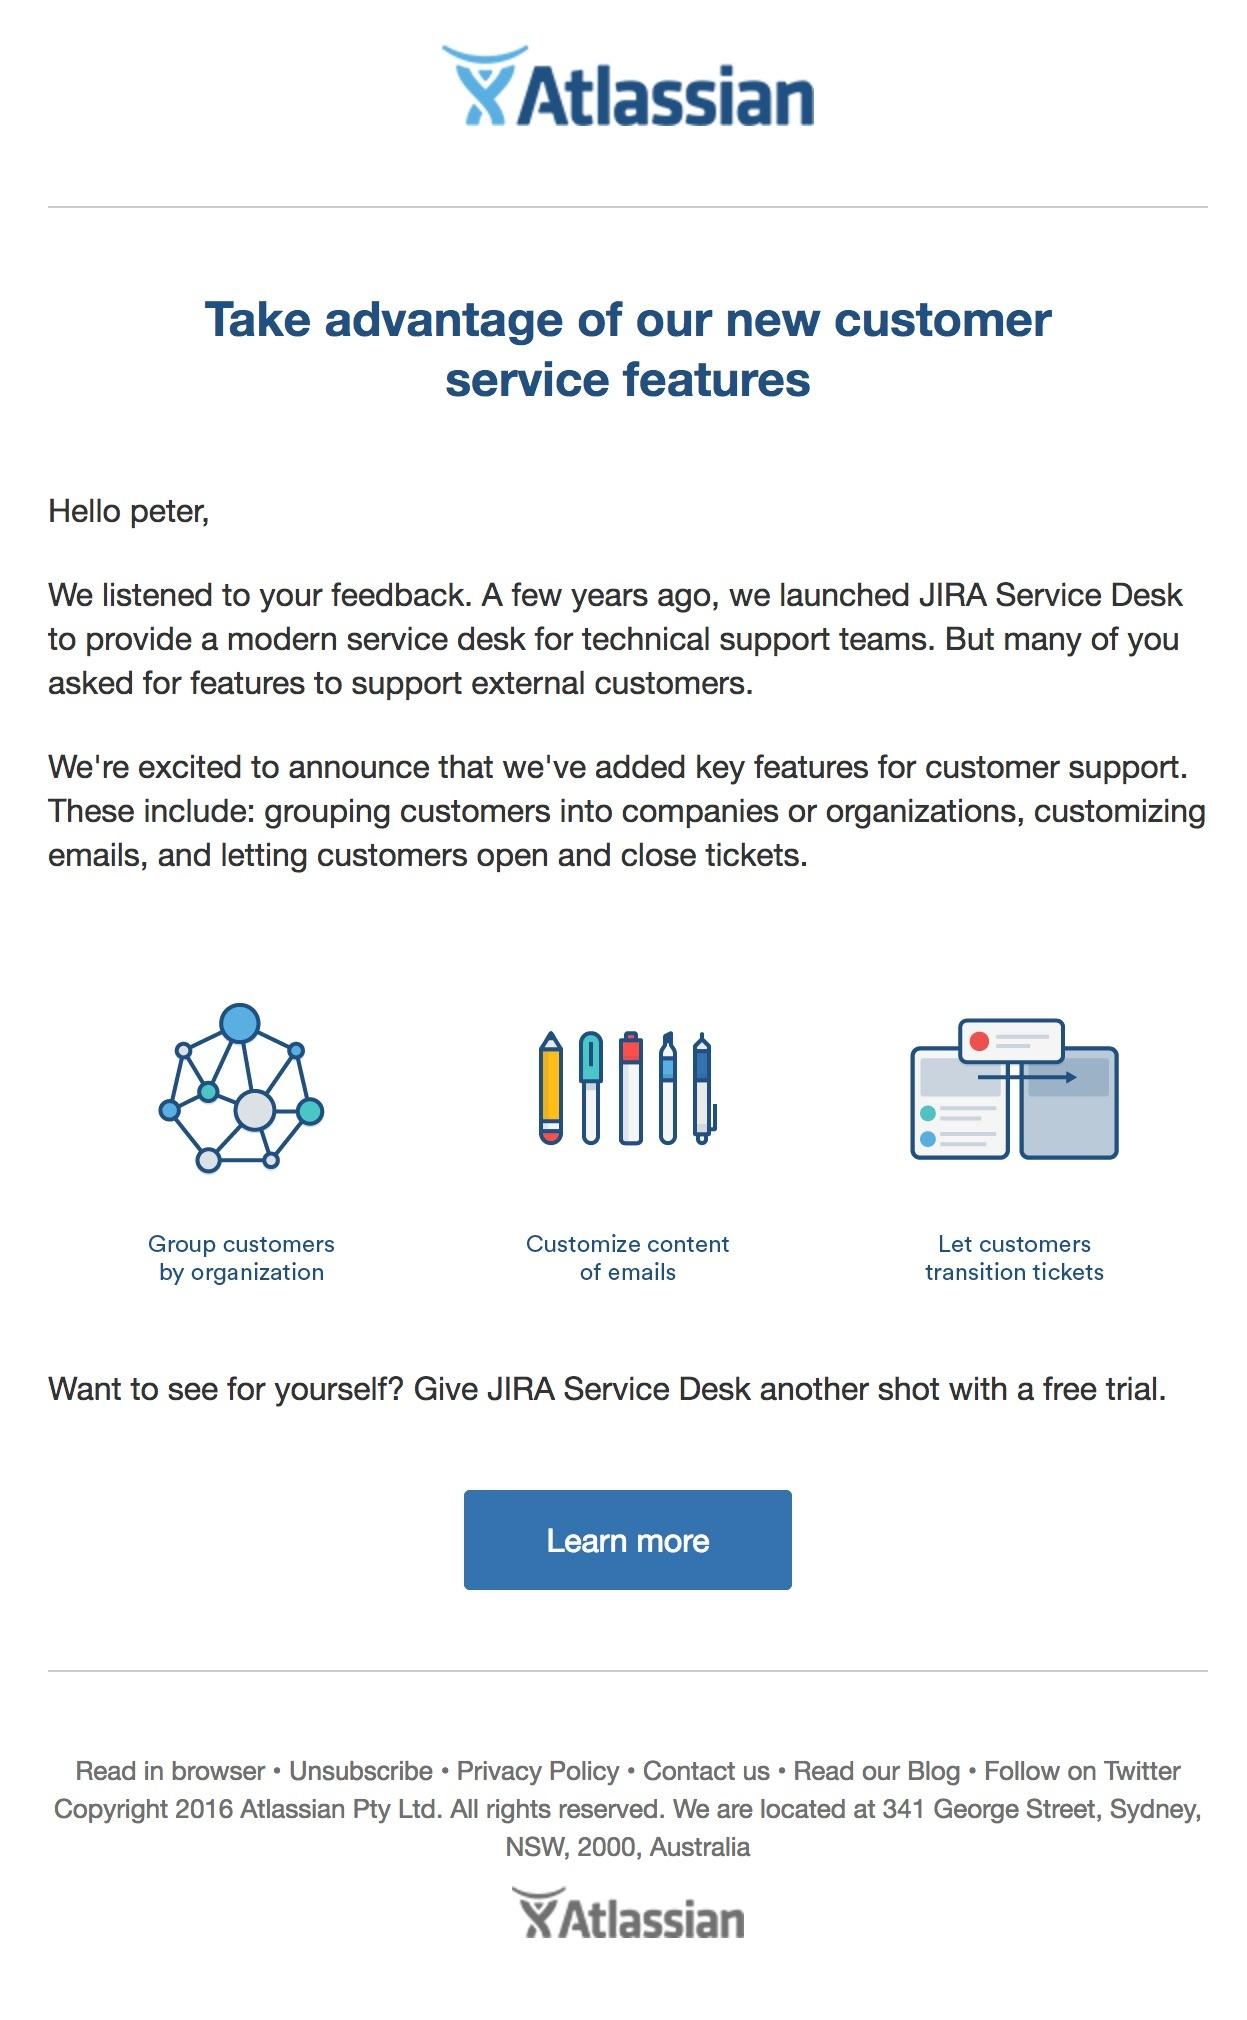 Atlassian tells users how it's serving them